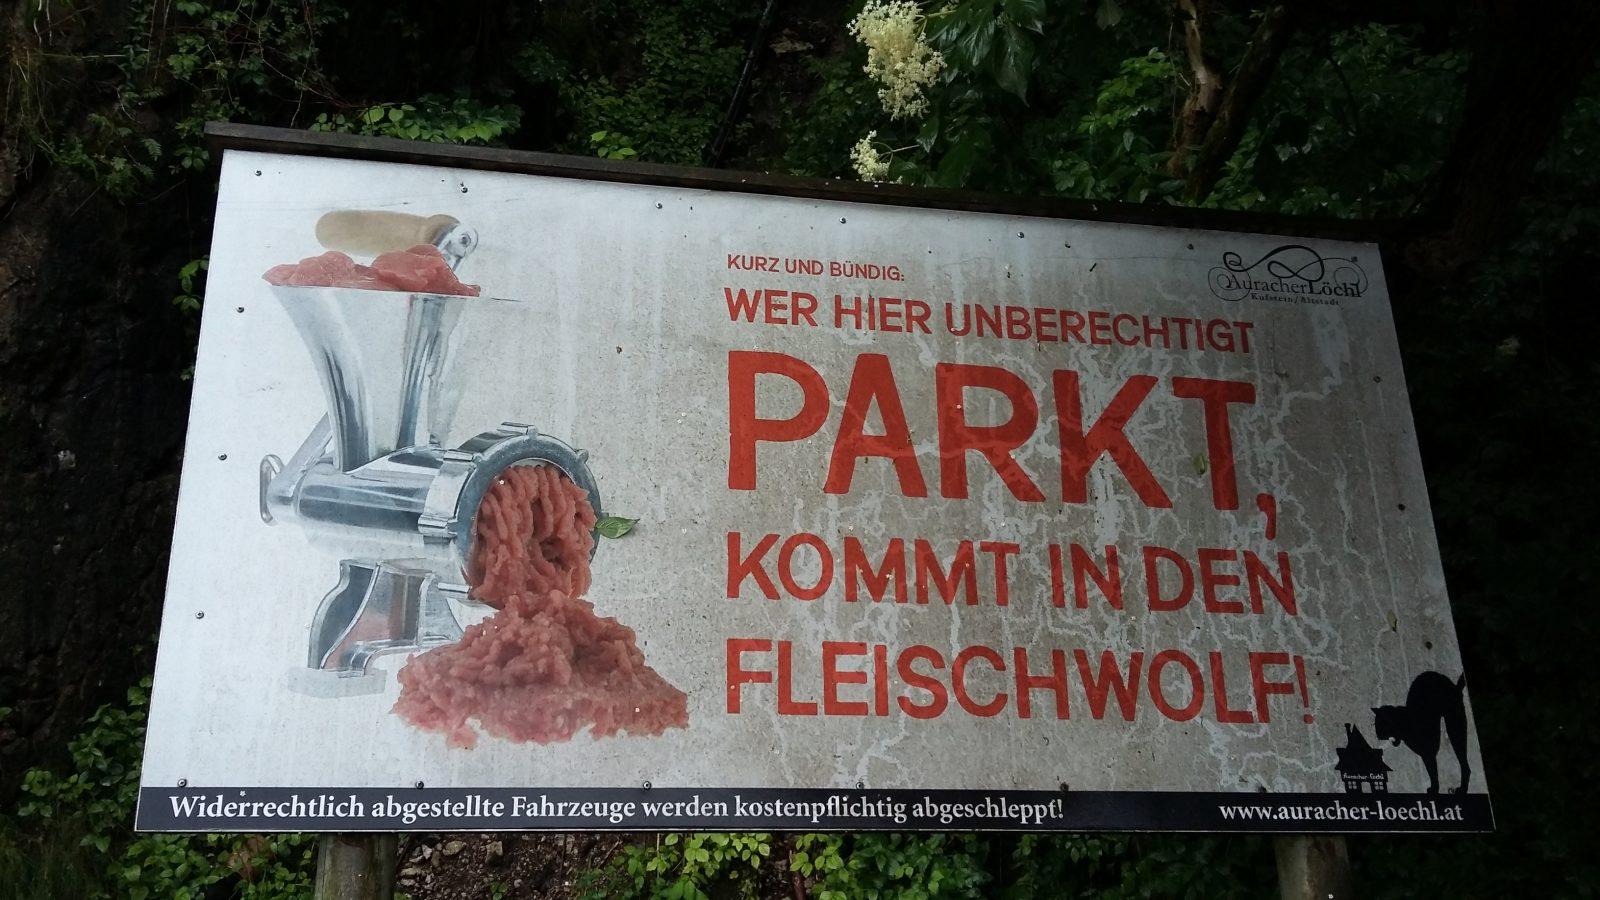 Servicepionier_Servicekomplize_Armin_Nagel_Orte_des_Grauens_Parkplatz (14)